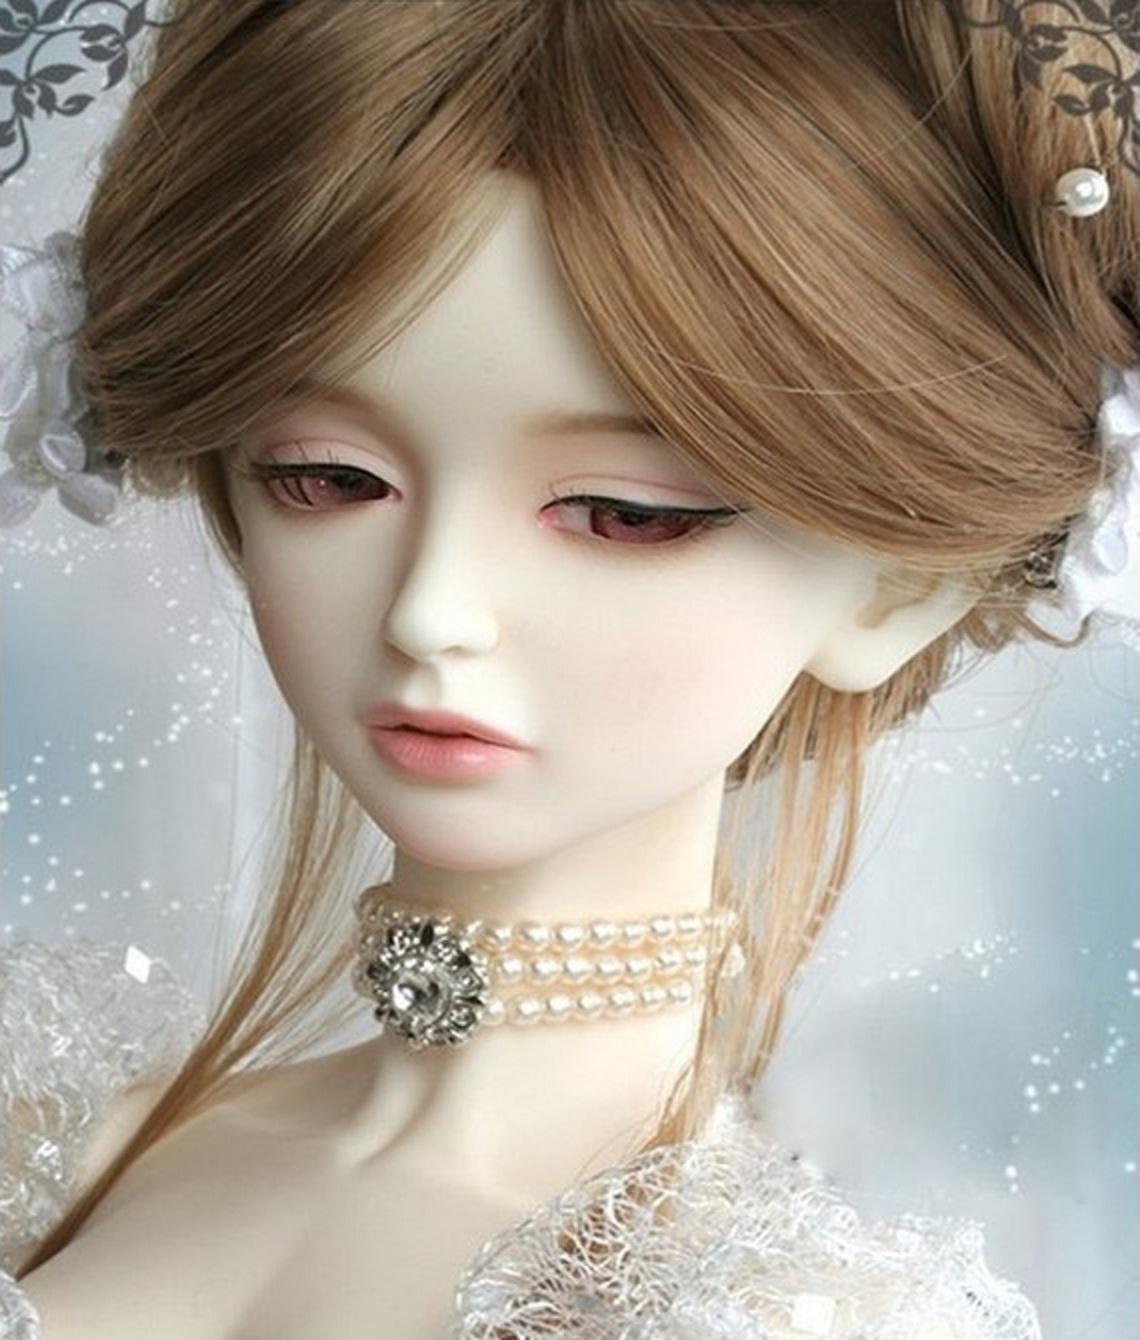 Cute Baby Barbie Doll Wallpaper Beautiful Desktop Hd Wallpapers